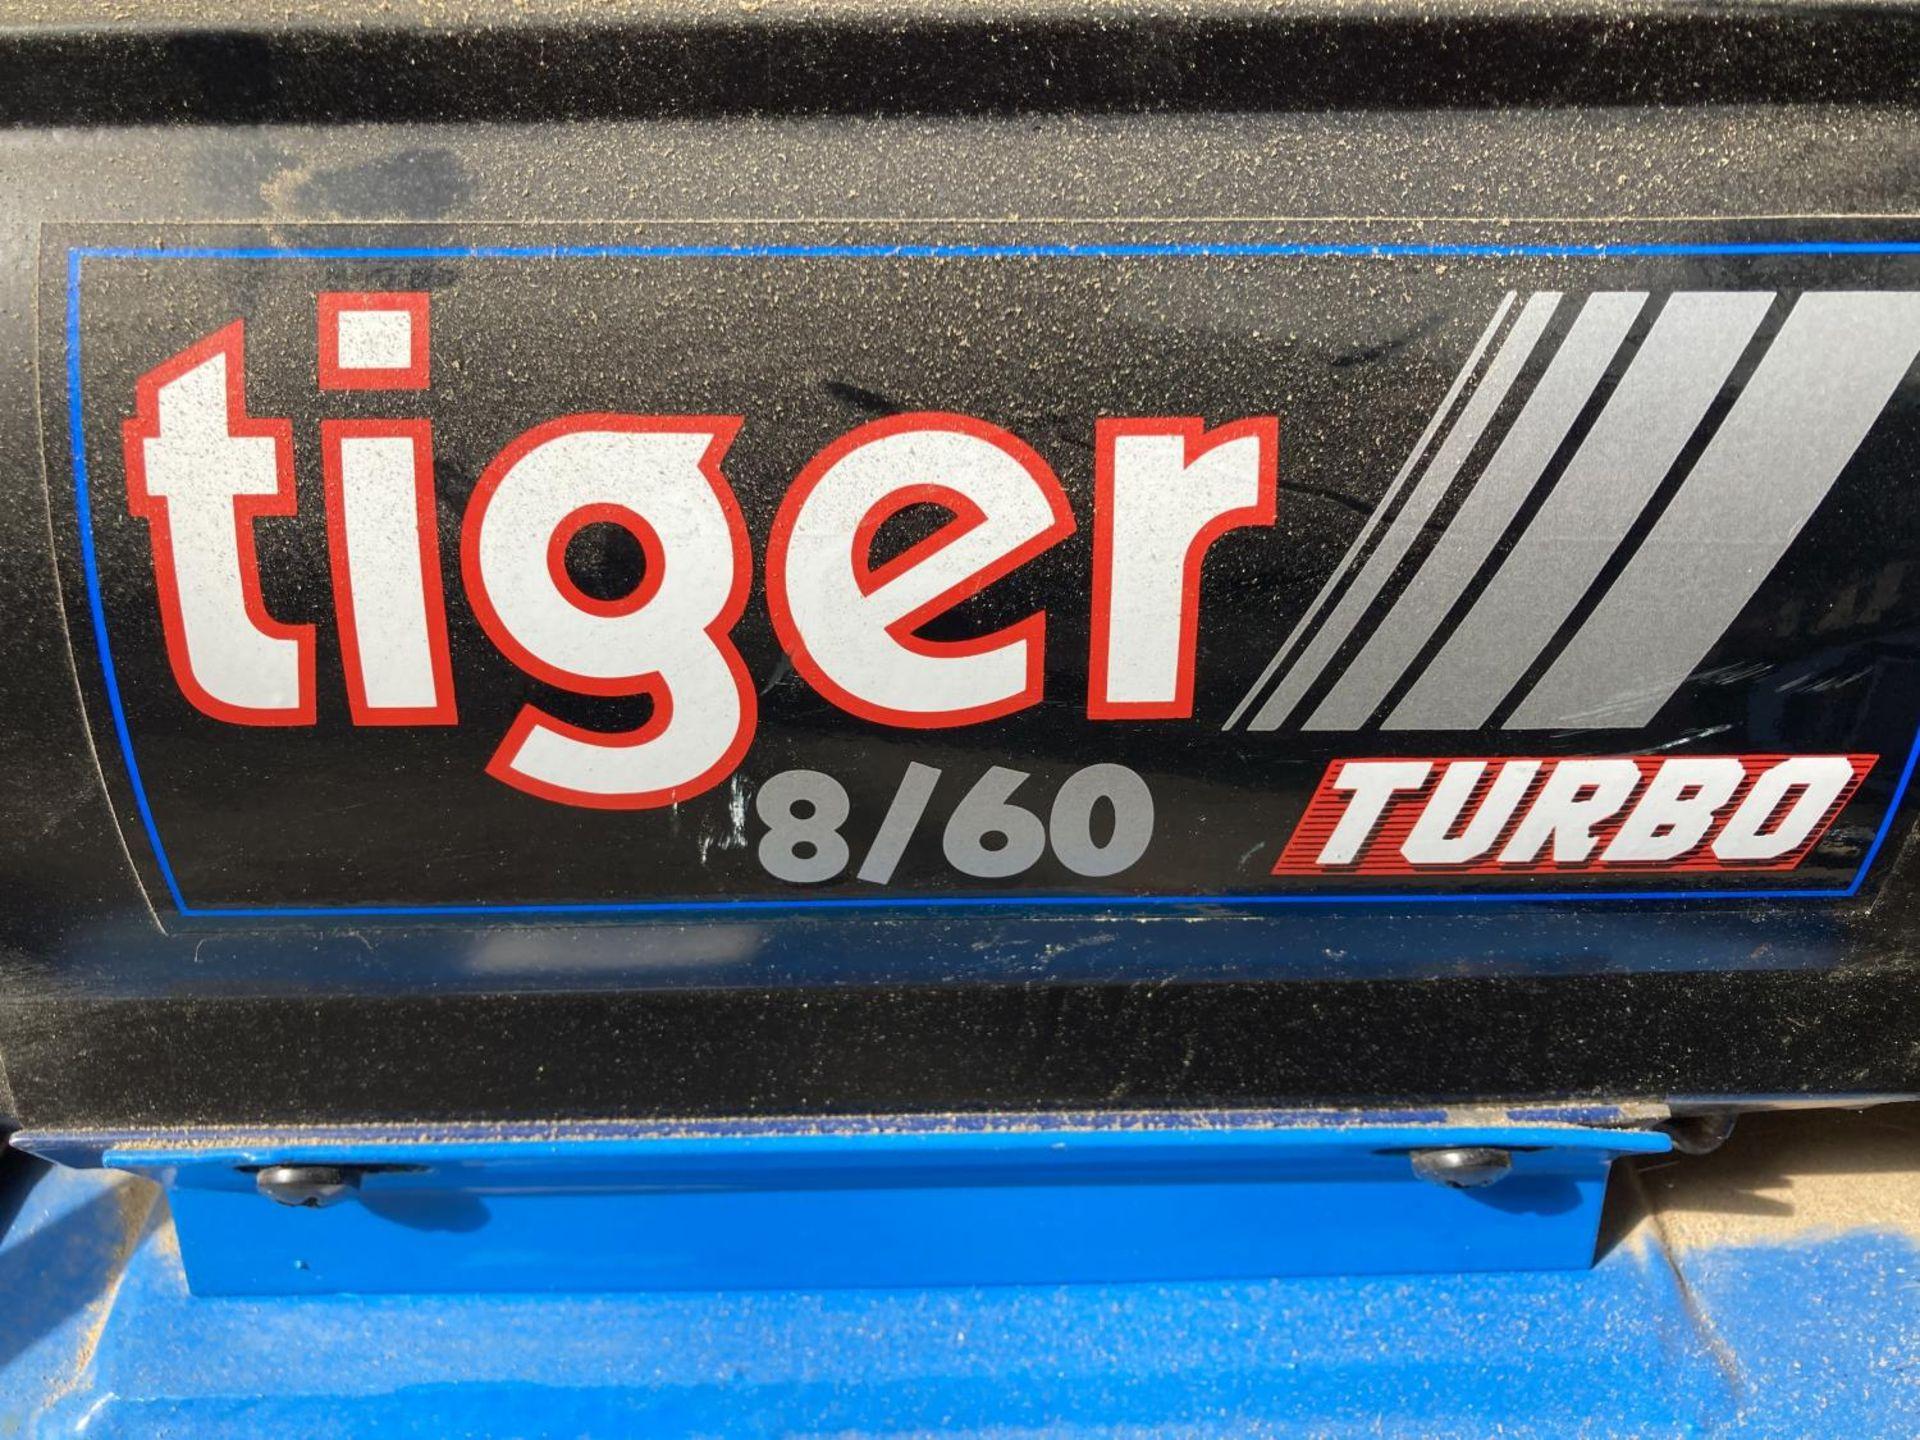 A MASTER TIGER 8/60 TURBO COMPRESSOR NO VAT - Image 2 of 3